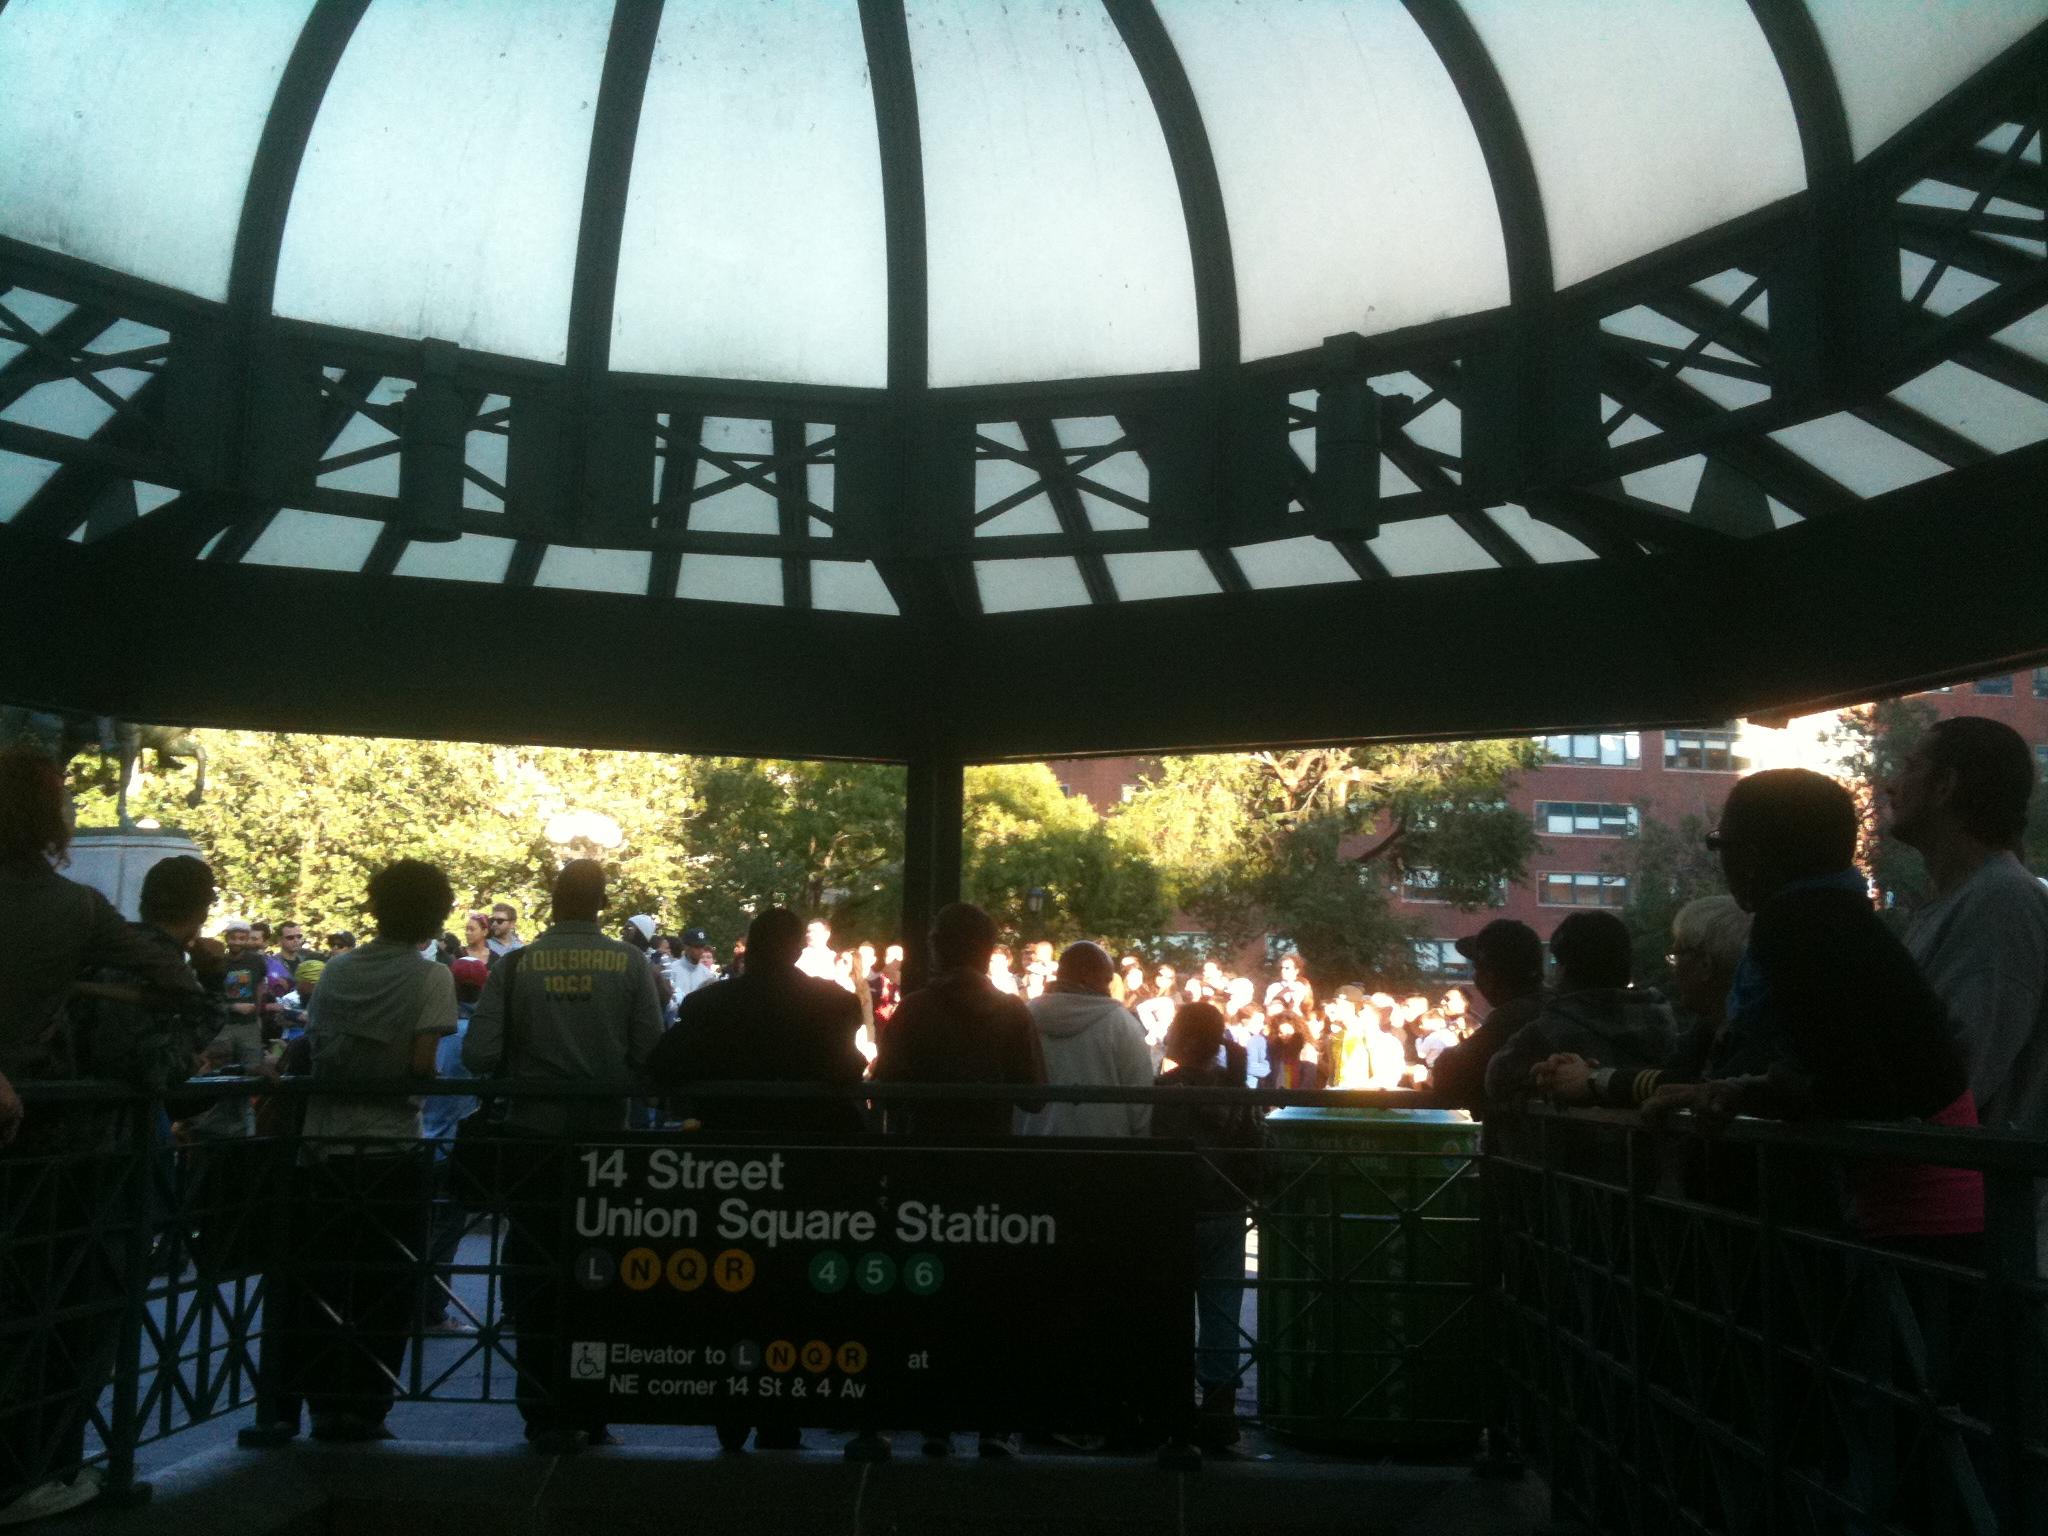 image of union square on subway